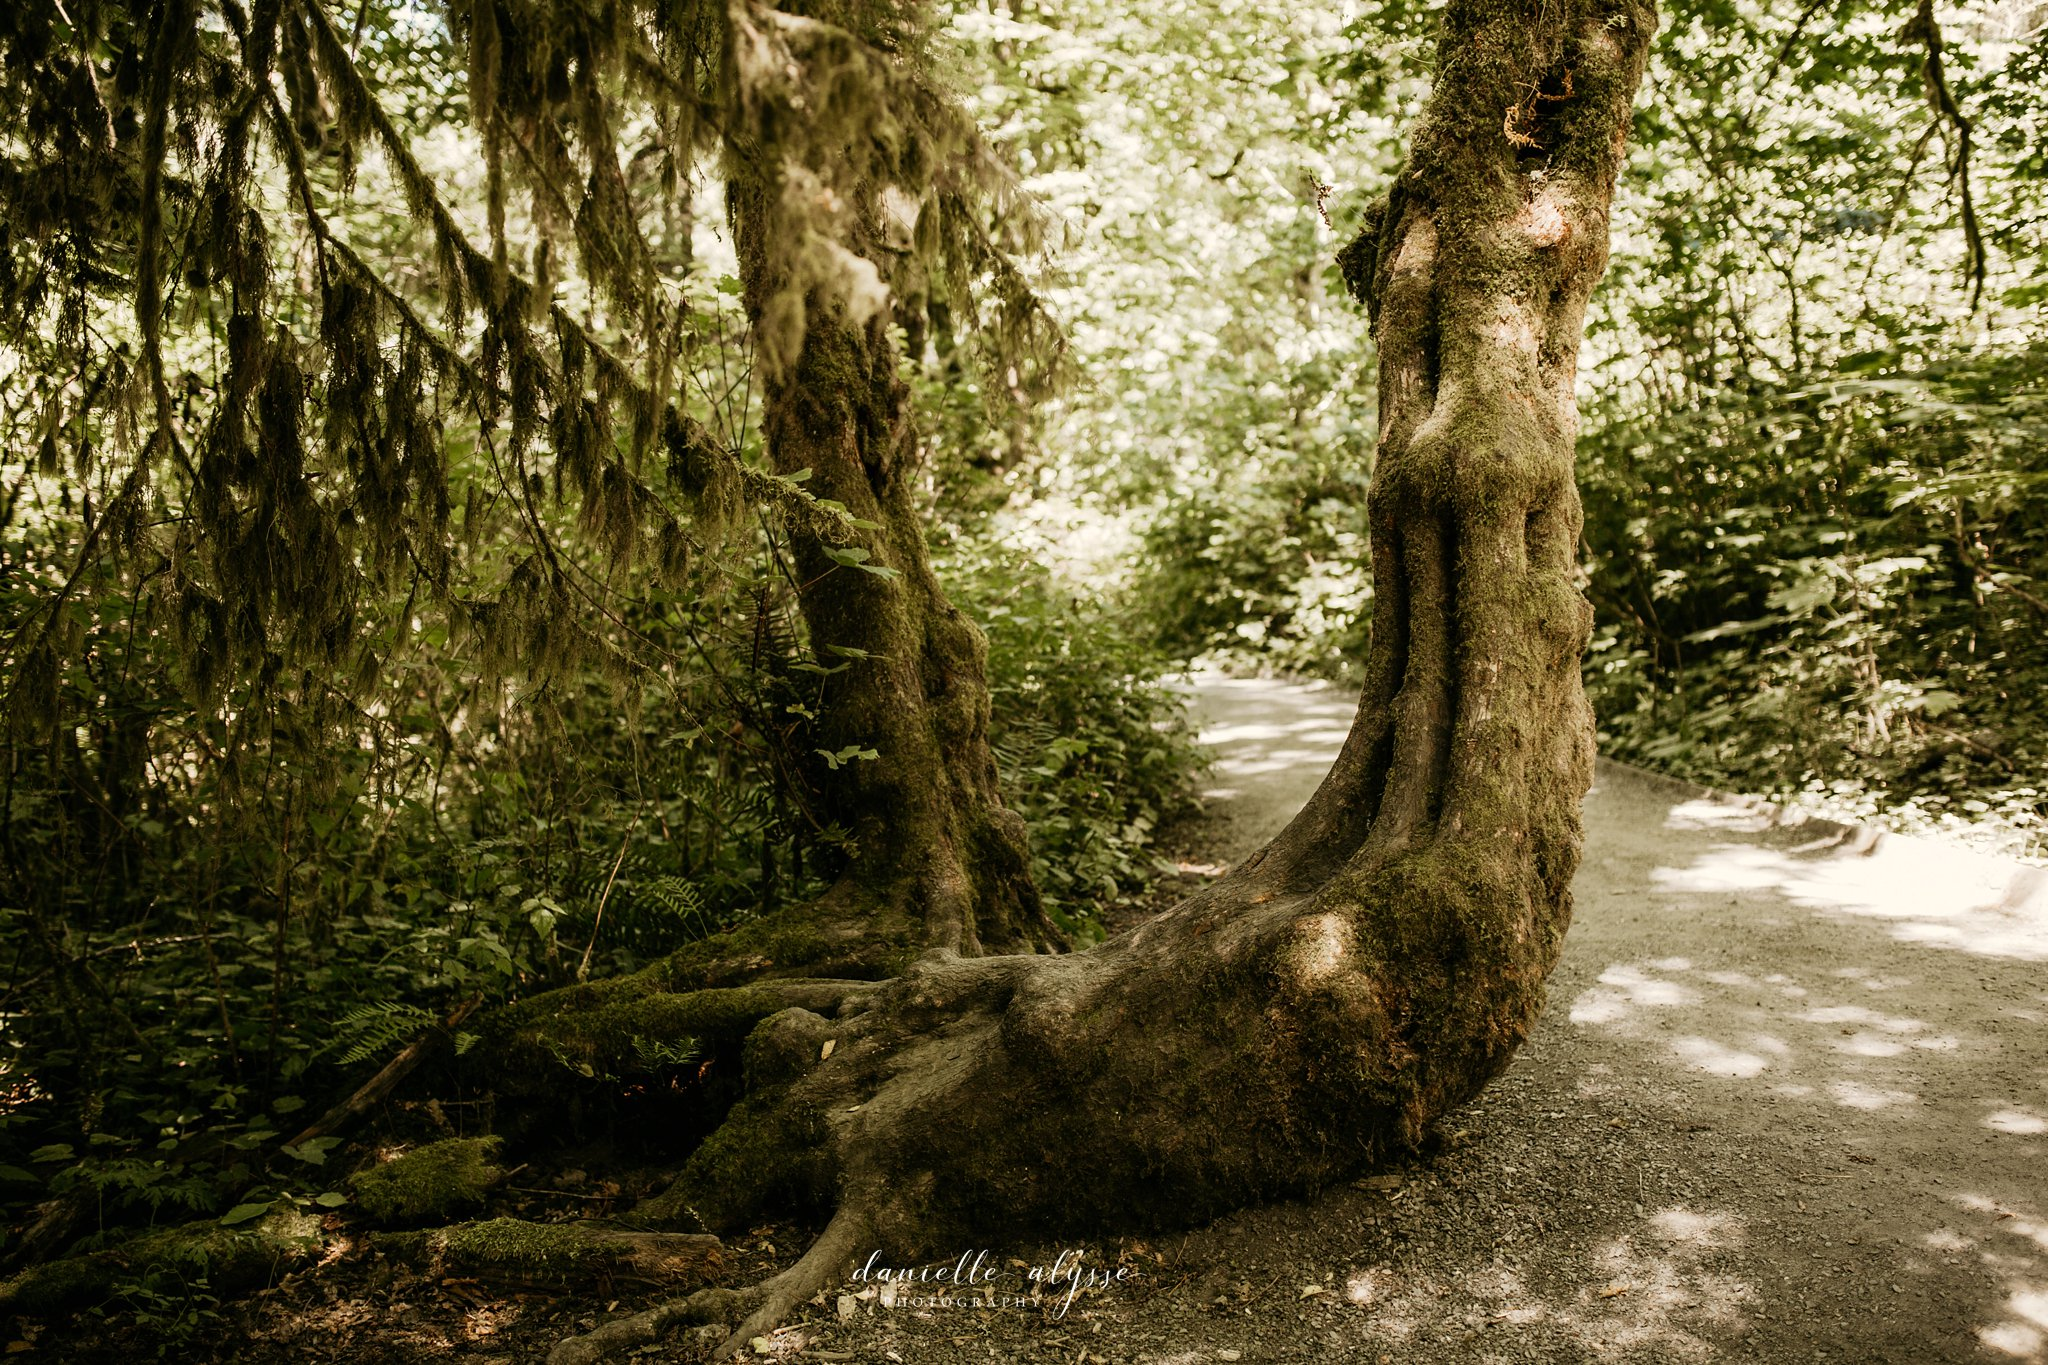 180720_travel_washington_destination_seattle_danielle_alysse_photography_blog_220_WEB.jpg